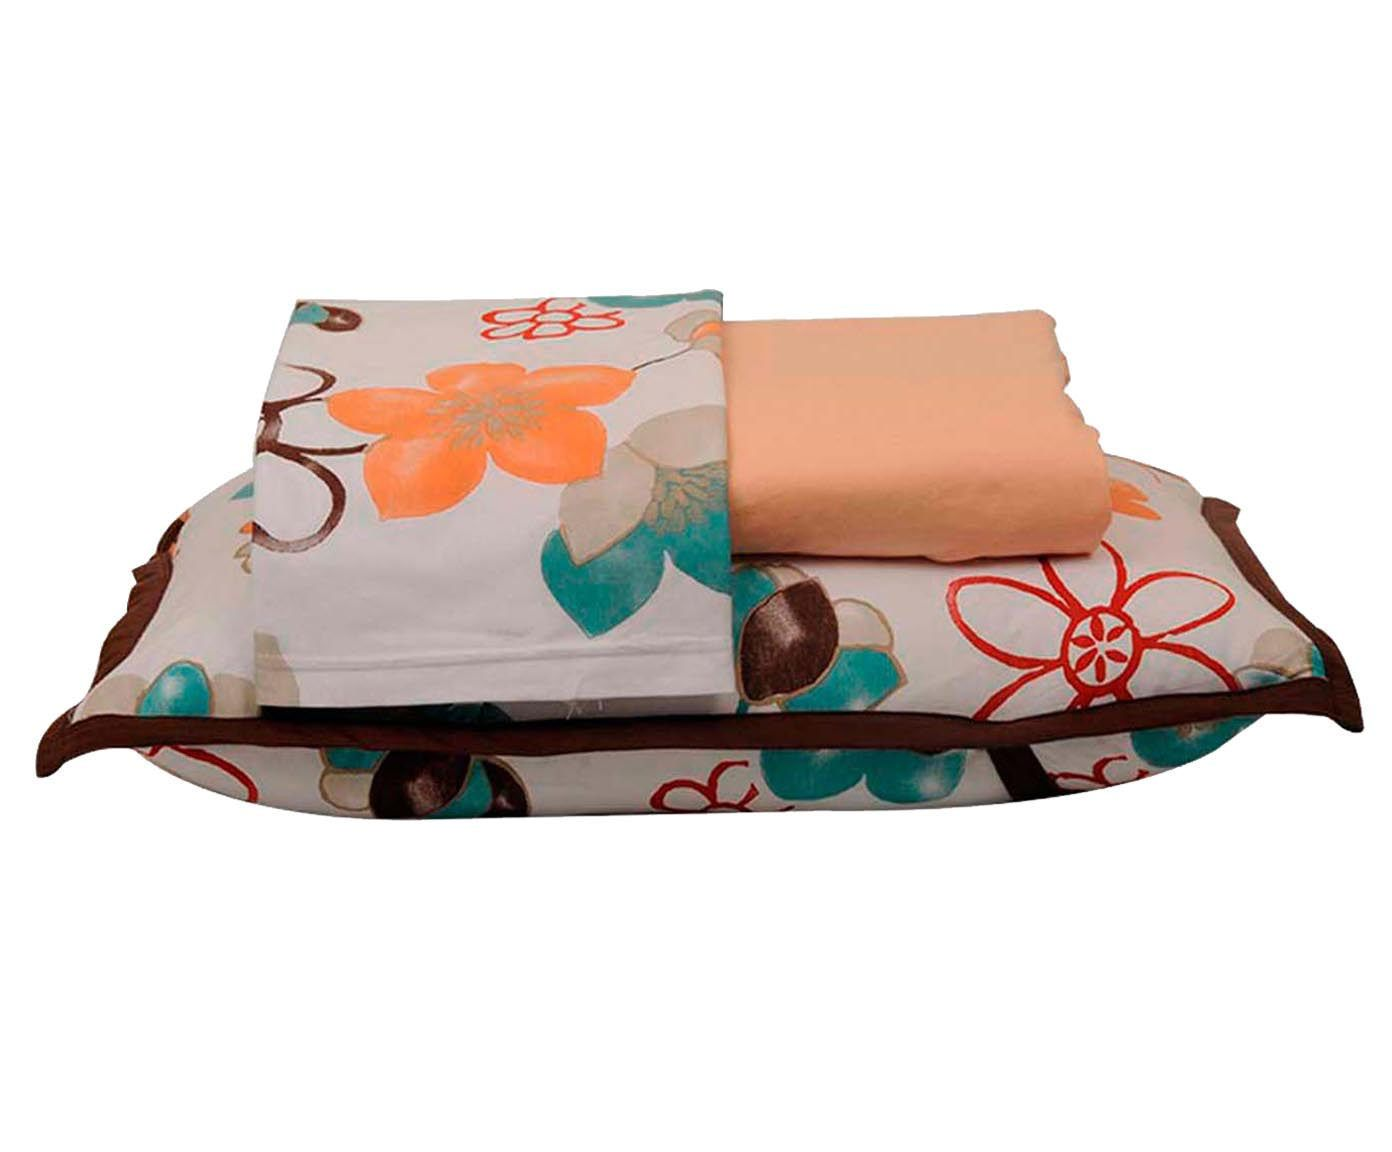 Jogo de lençol anne marie - para cama queen size   Westwing.com.br